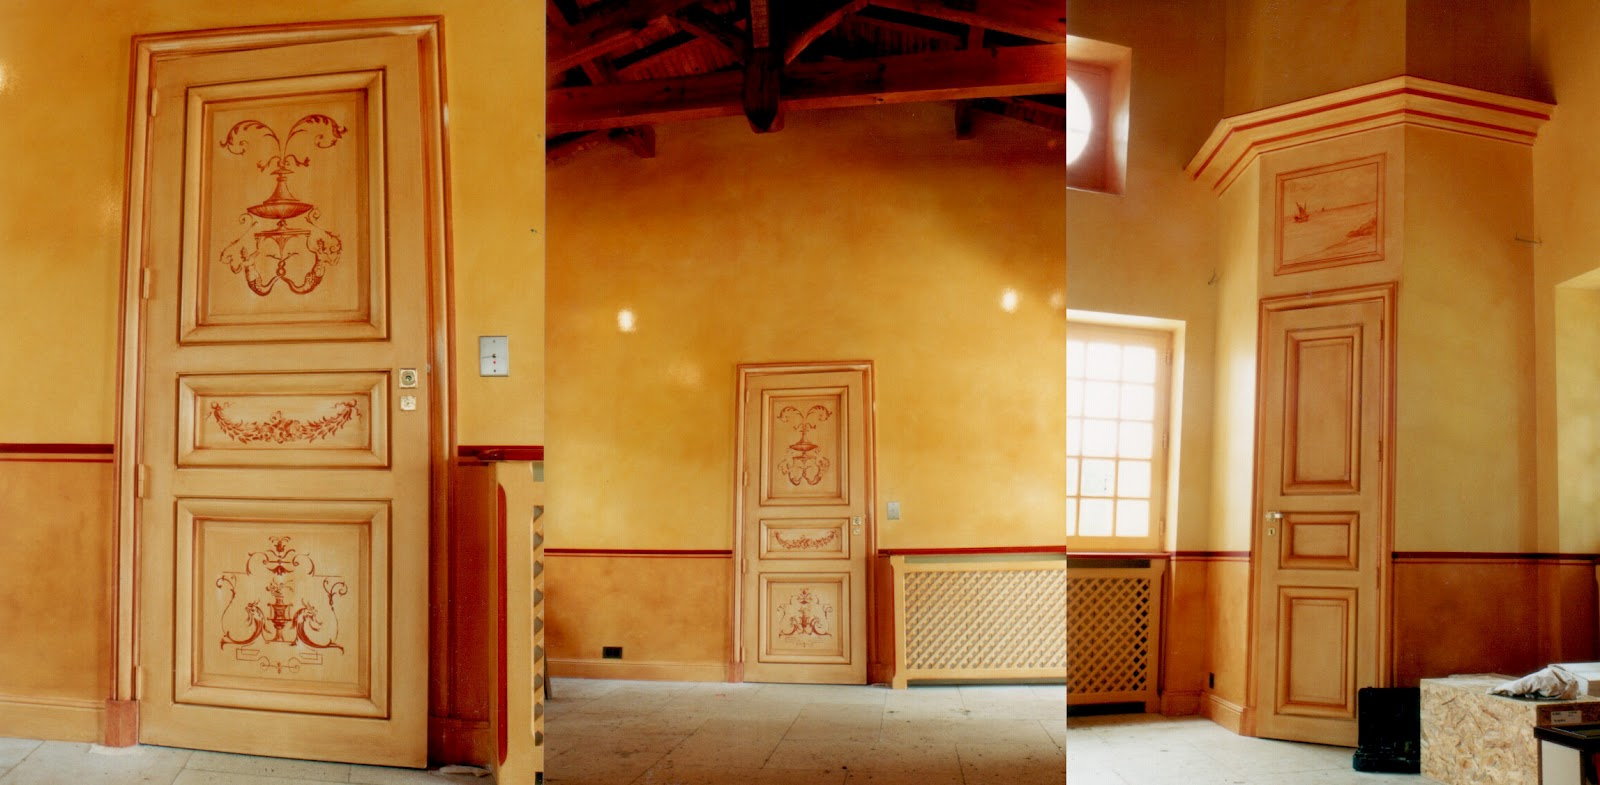 isabelle junqua artiste peintre d corateur portfolio patines. Black Bedroom Furniture Sets. Home Design Ideas